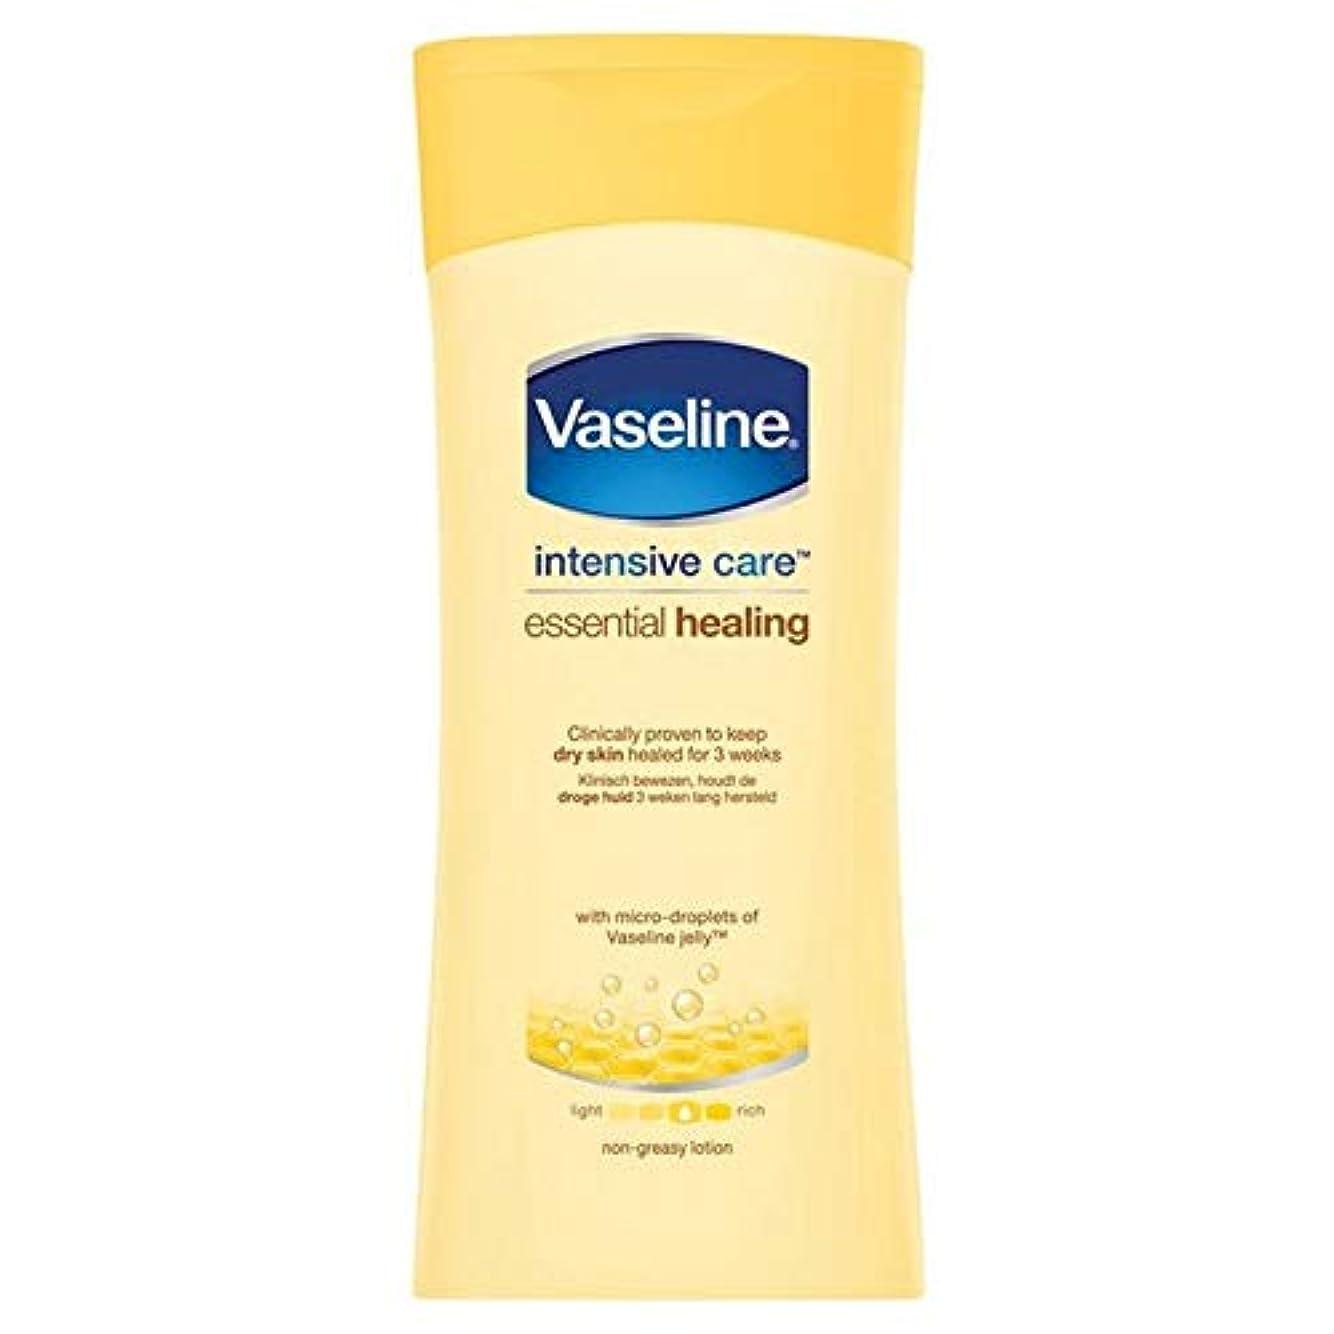 [Vaseline ] ワセリン集中治療不可欠ローション200Ml - Vaseline Intensive Care Essential Lotion 200ml [並行輸入品]